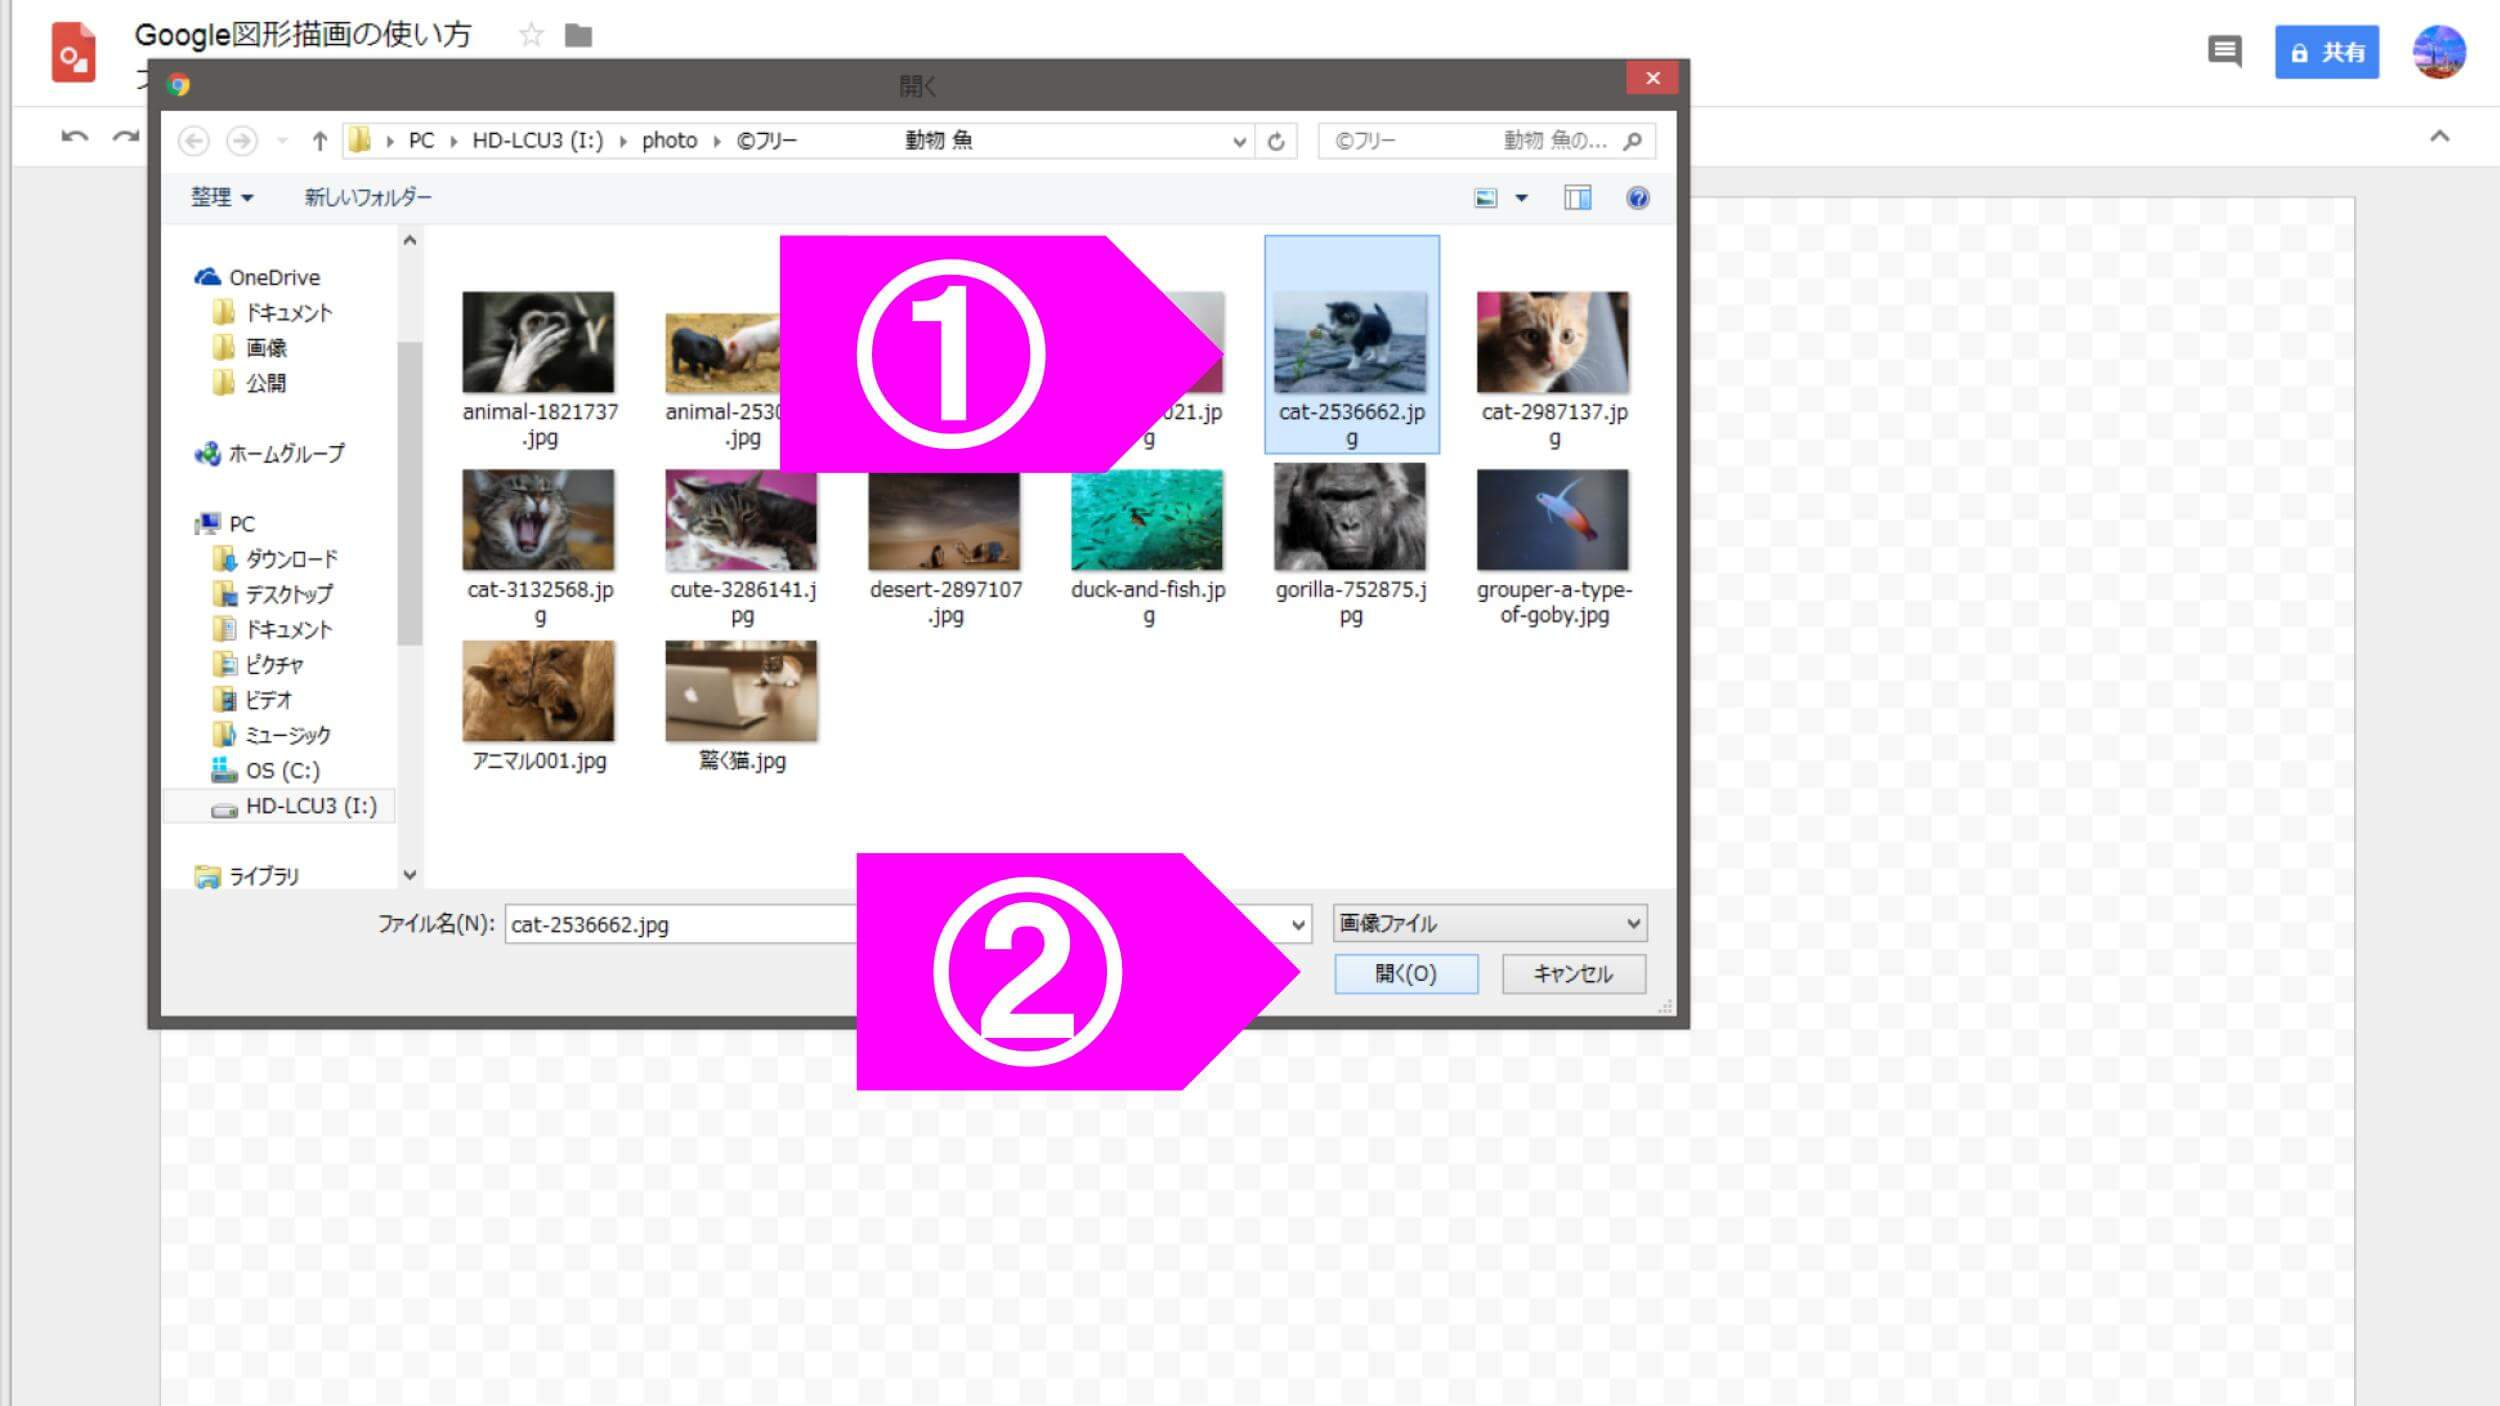 Google図形描画の使い方 挿入→画像→パソコンからアップロード